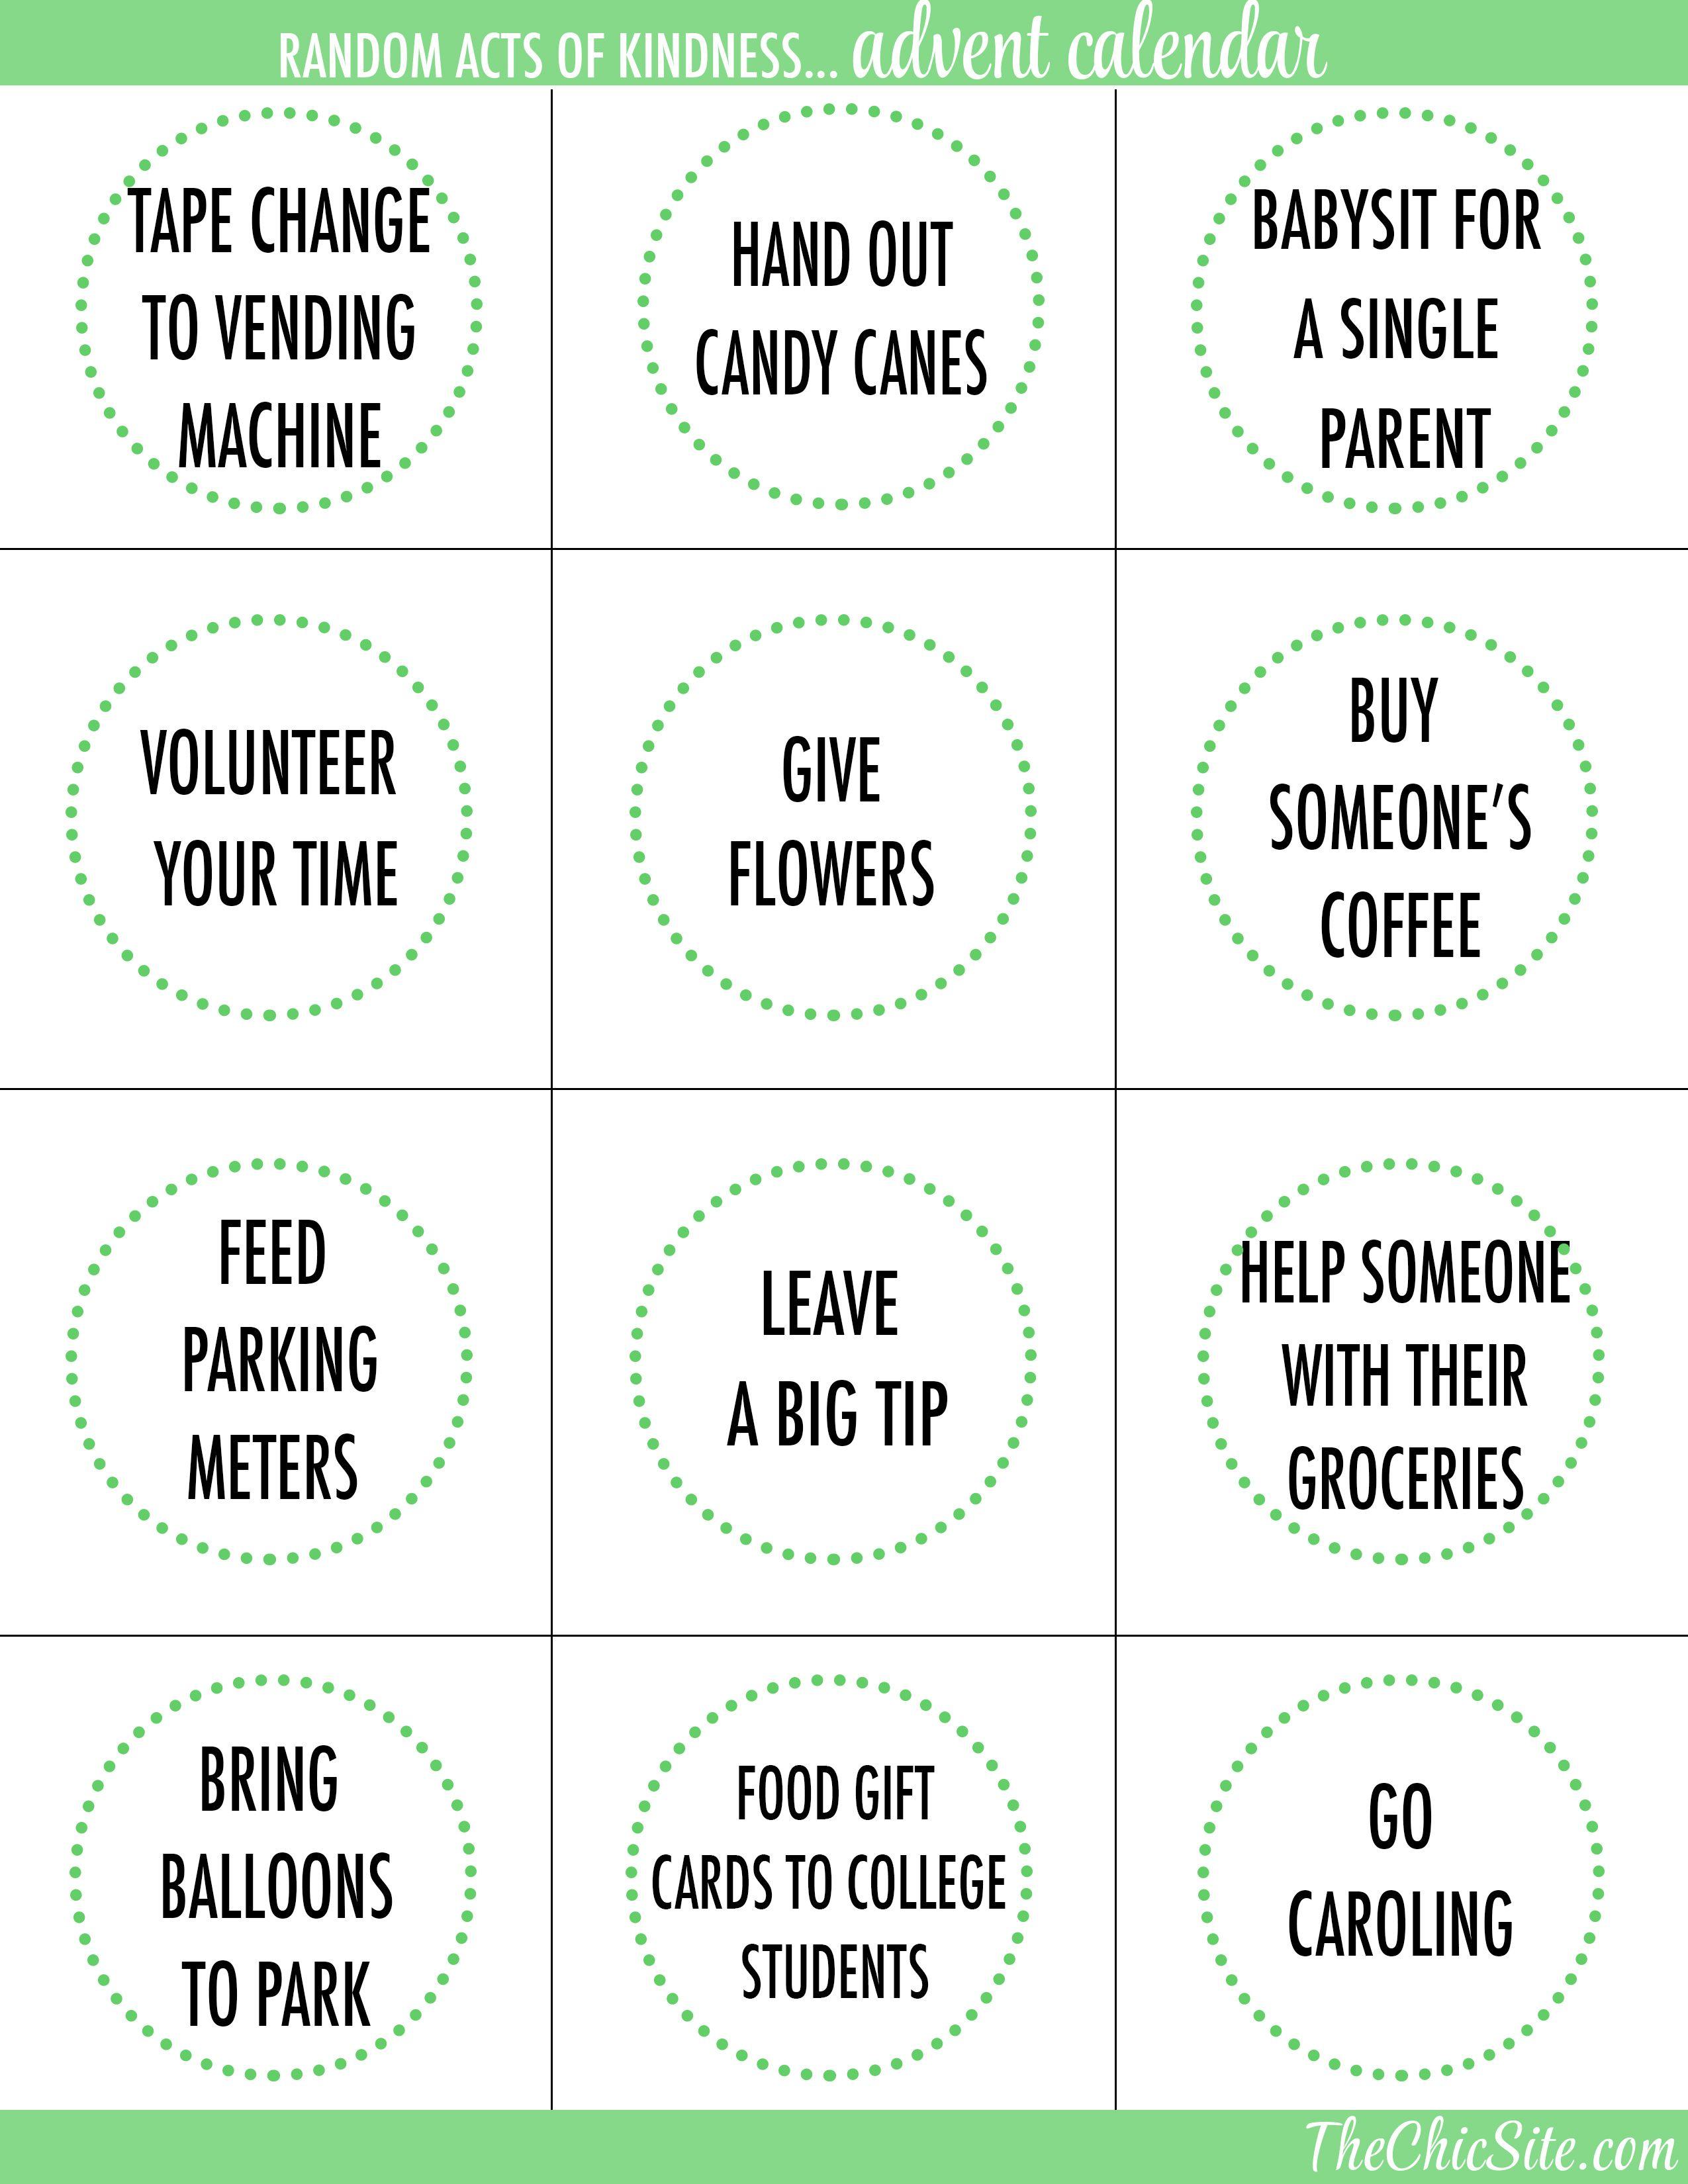 8 Easy Diy Advent Calendars